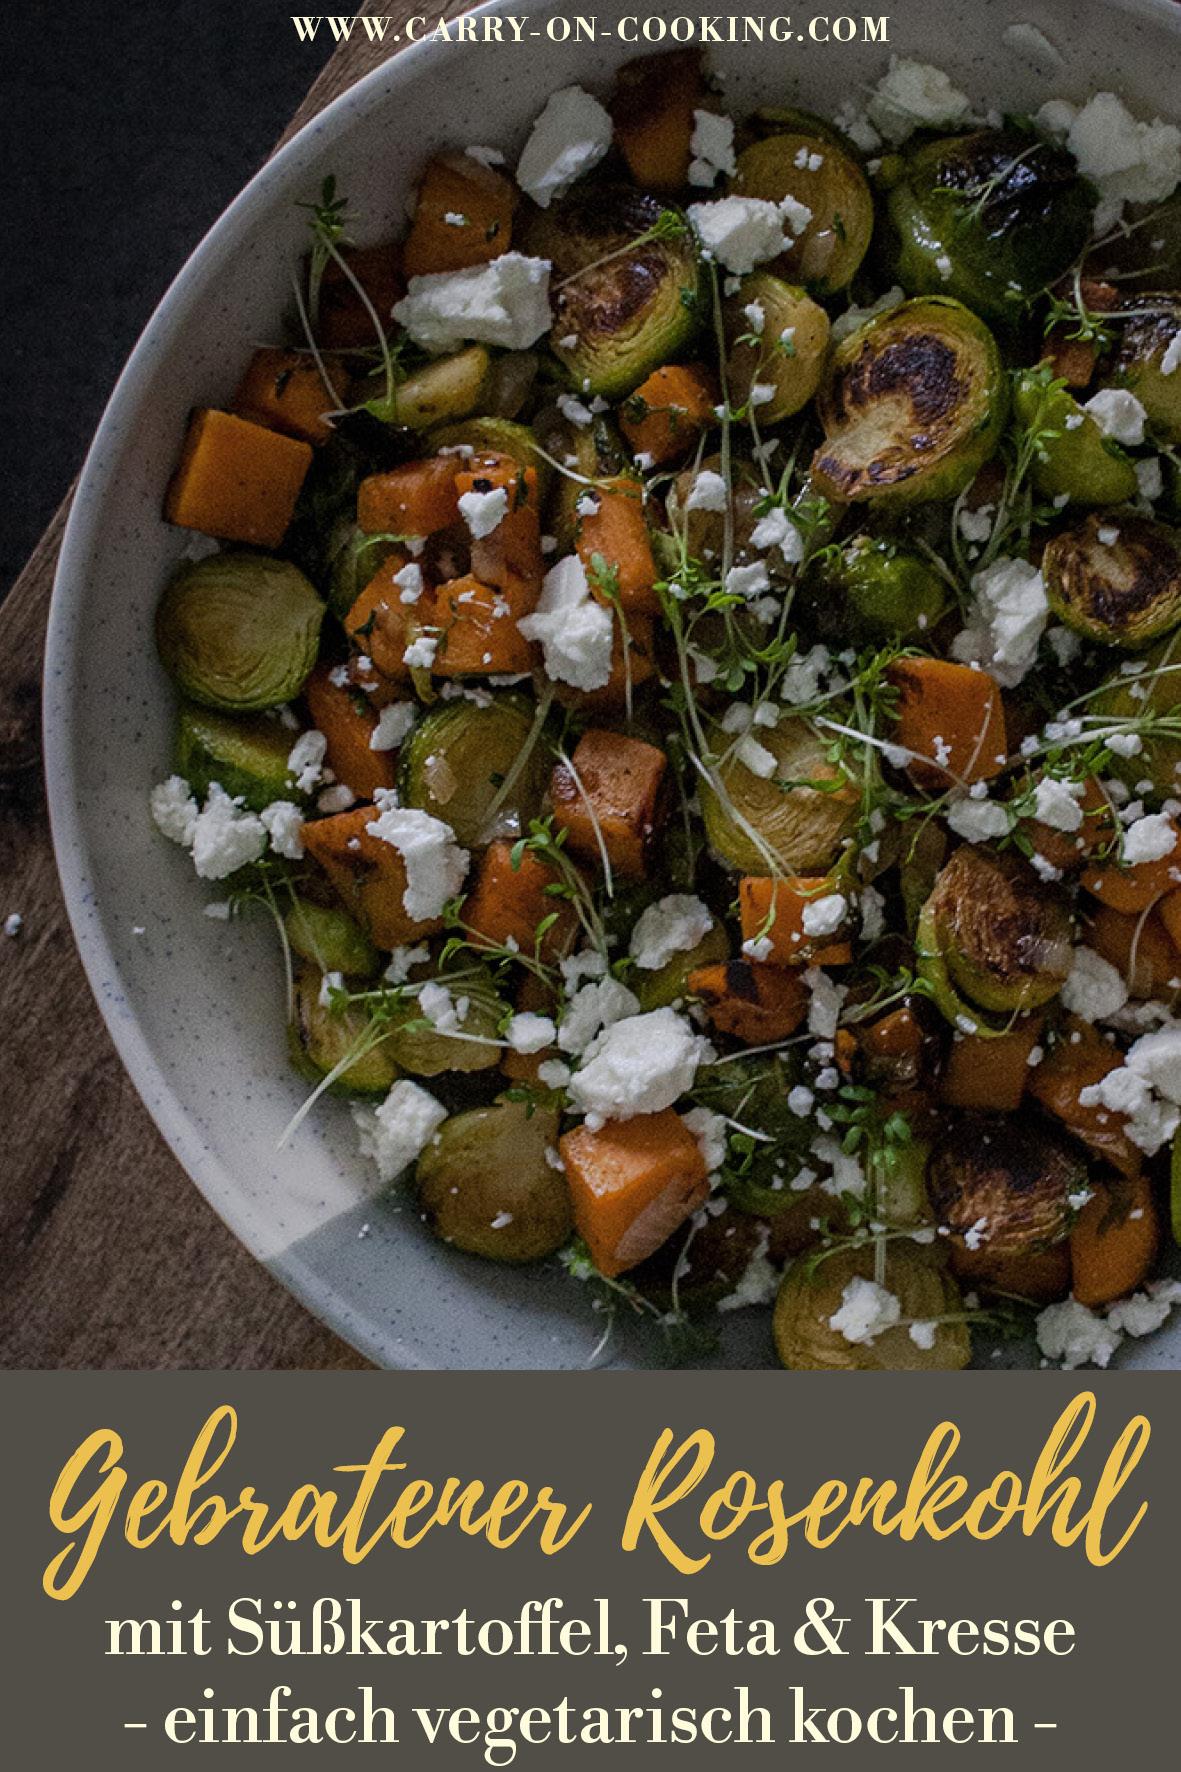 Pinterest-Pin: Gebratener Rosenkohl - vegetarisch lecker